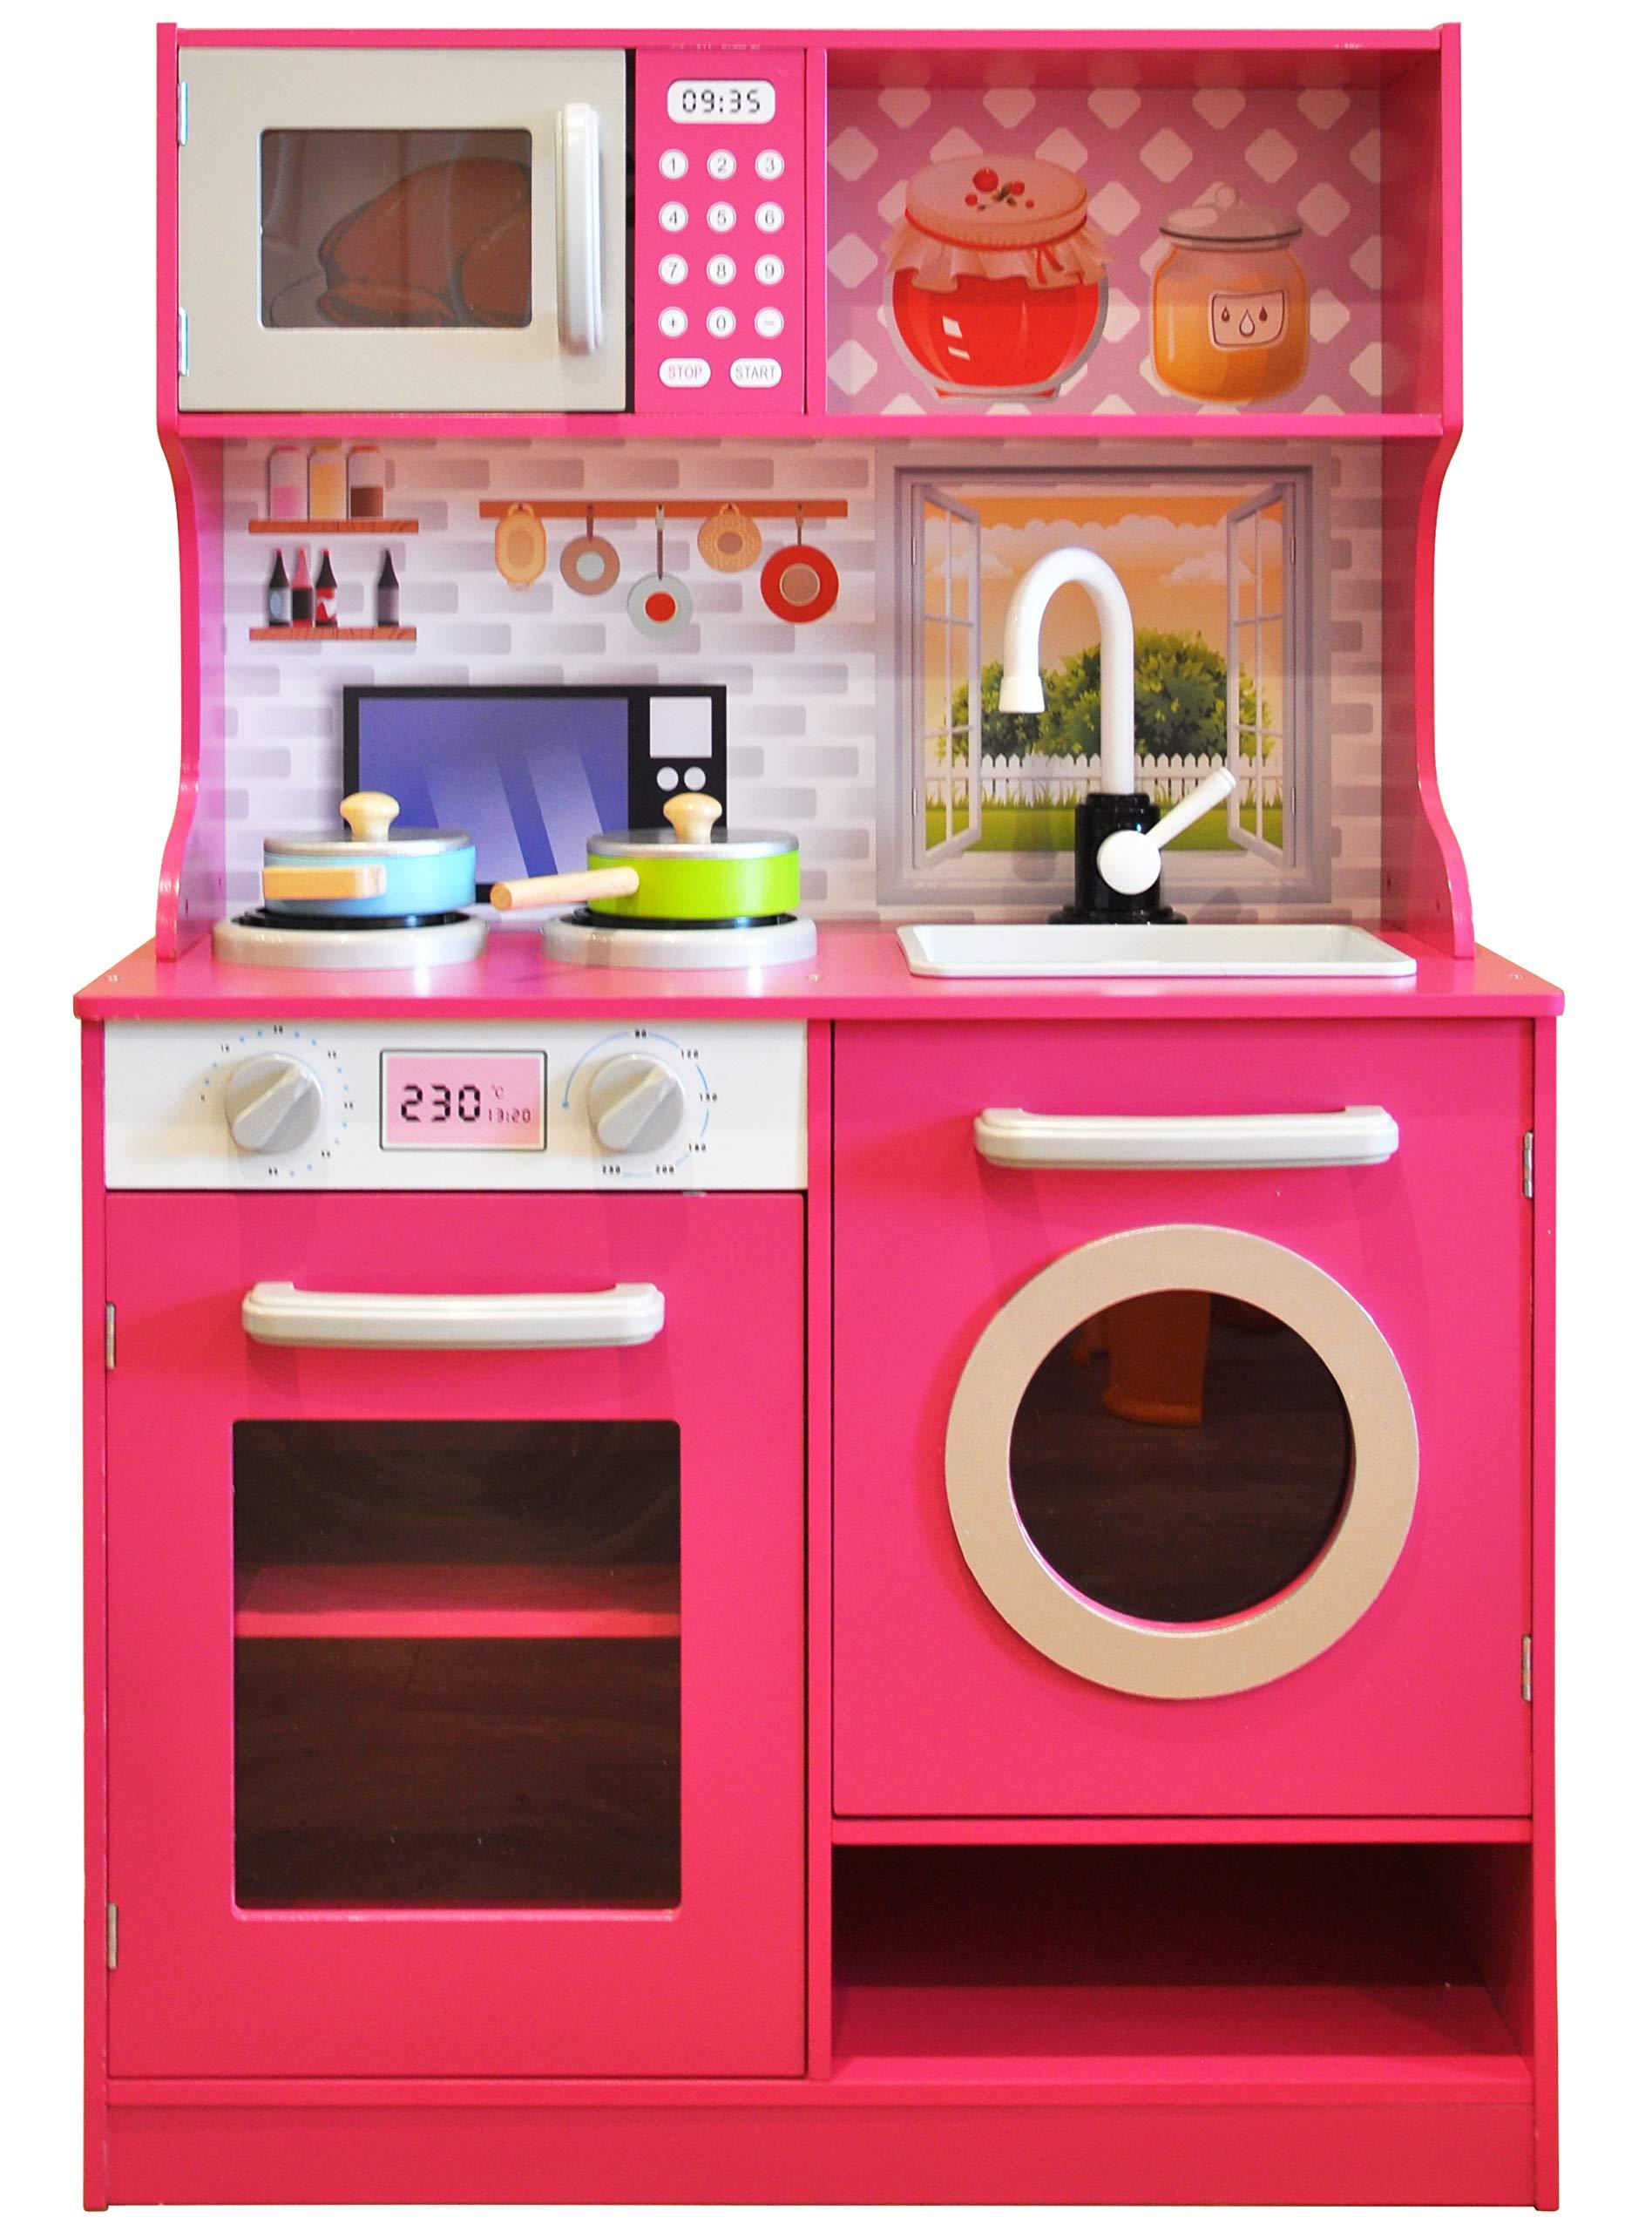 Rainbow Sophia Vibrant Wood Kids Play Kitchen with Cookware Accessories (Fuchsia)